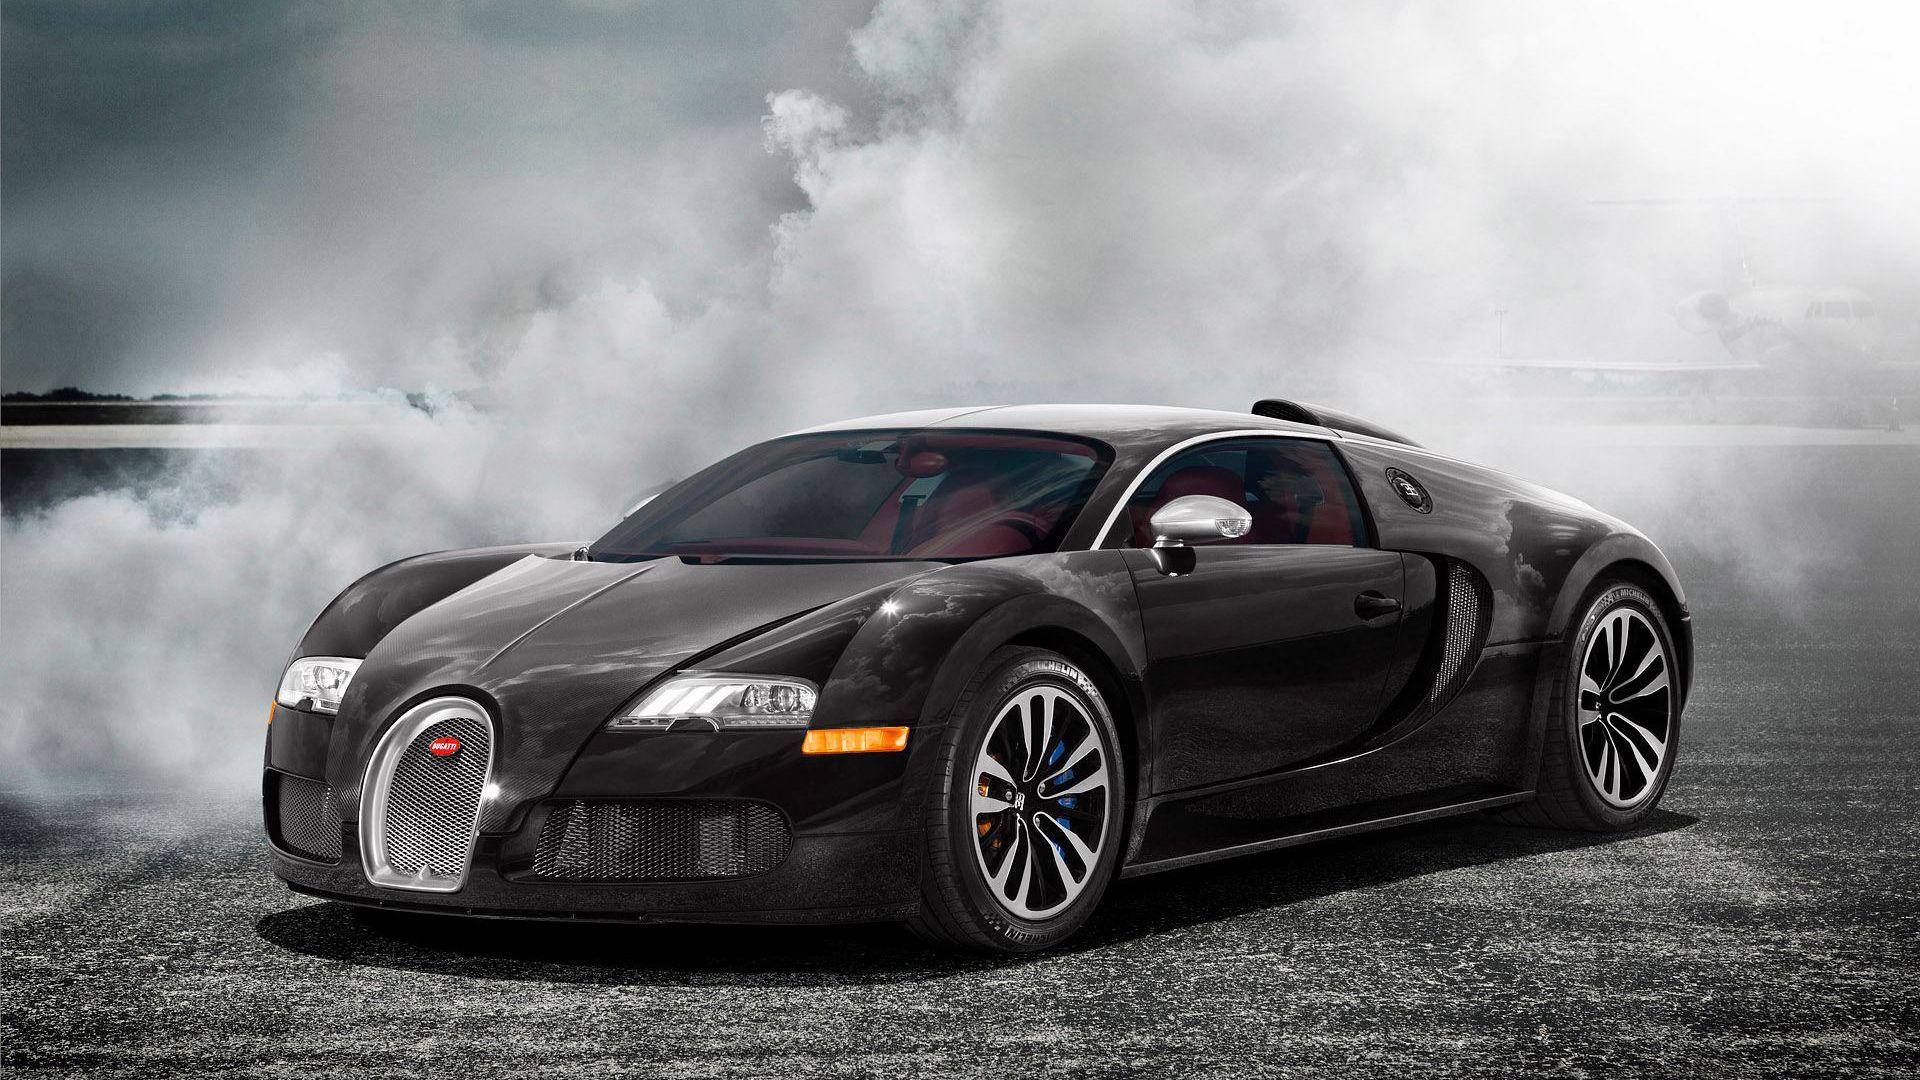 1f99f664f50680d9ce0b5dd94e9e0276 Stunning Bugatti Veyron Price In Brazil Cars Trend